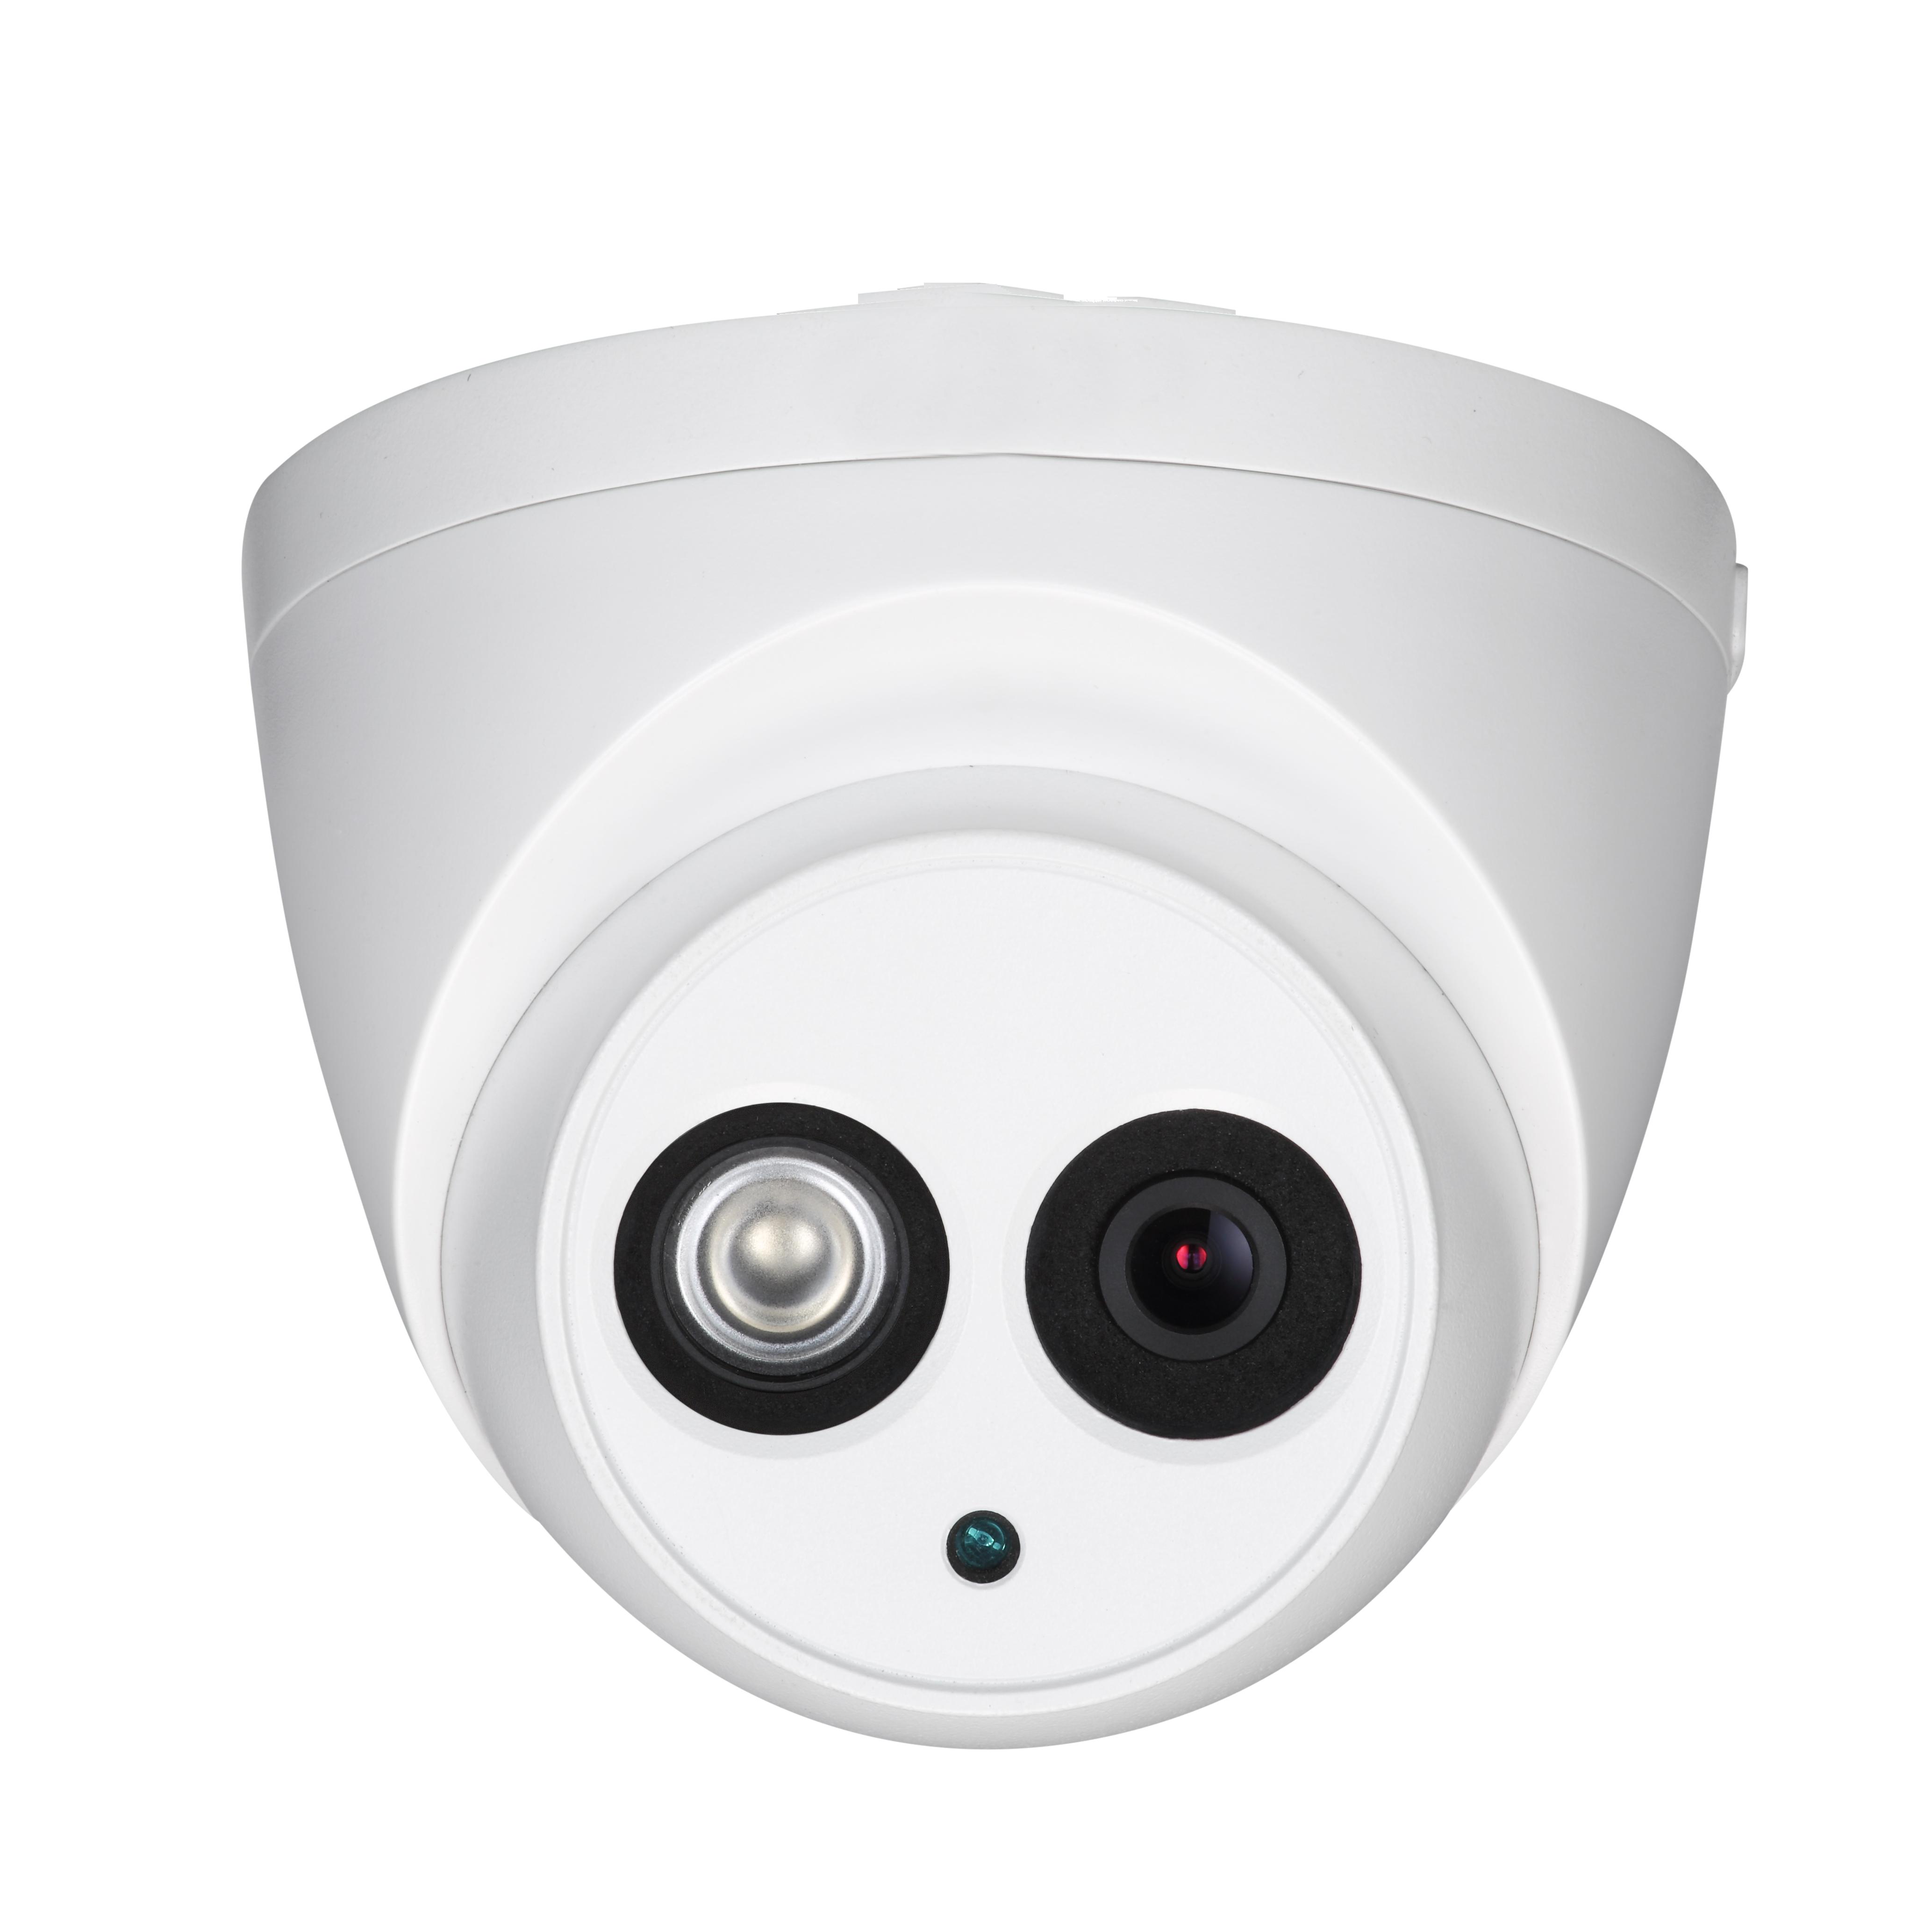 2Megapixel 1080P Water-proof IR HDCVI Dome Camera